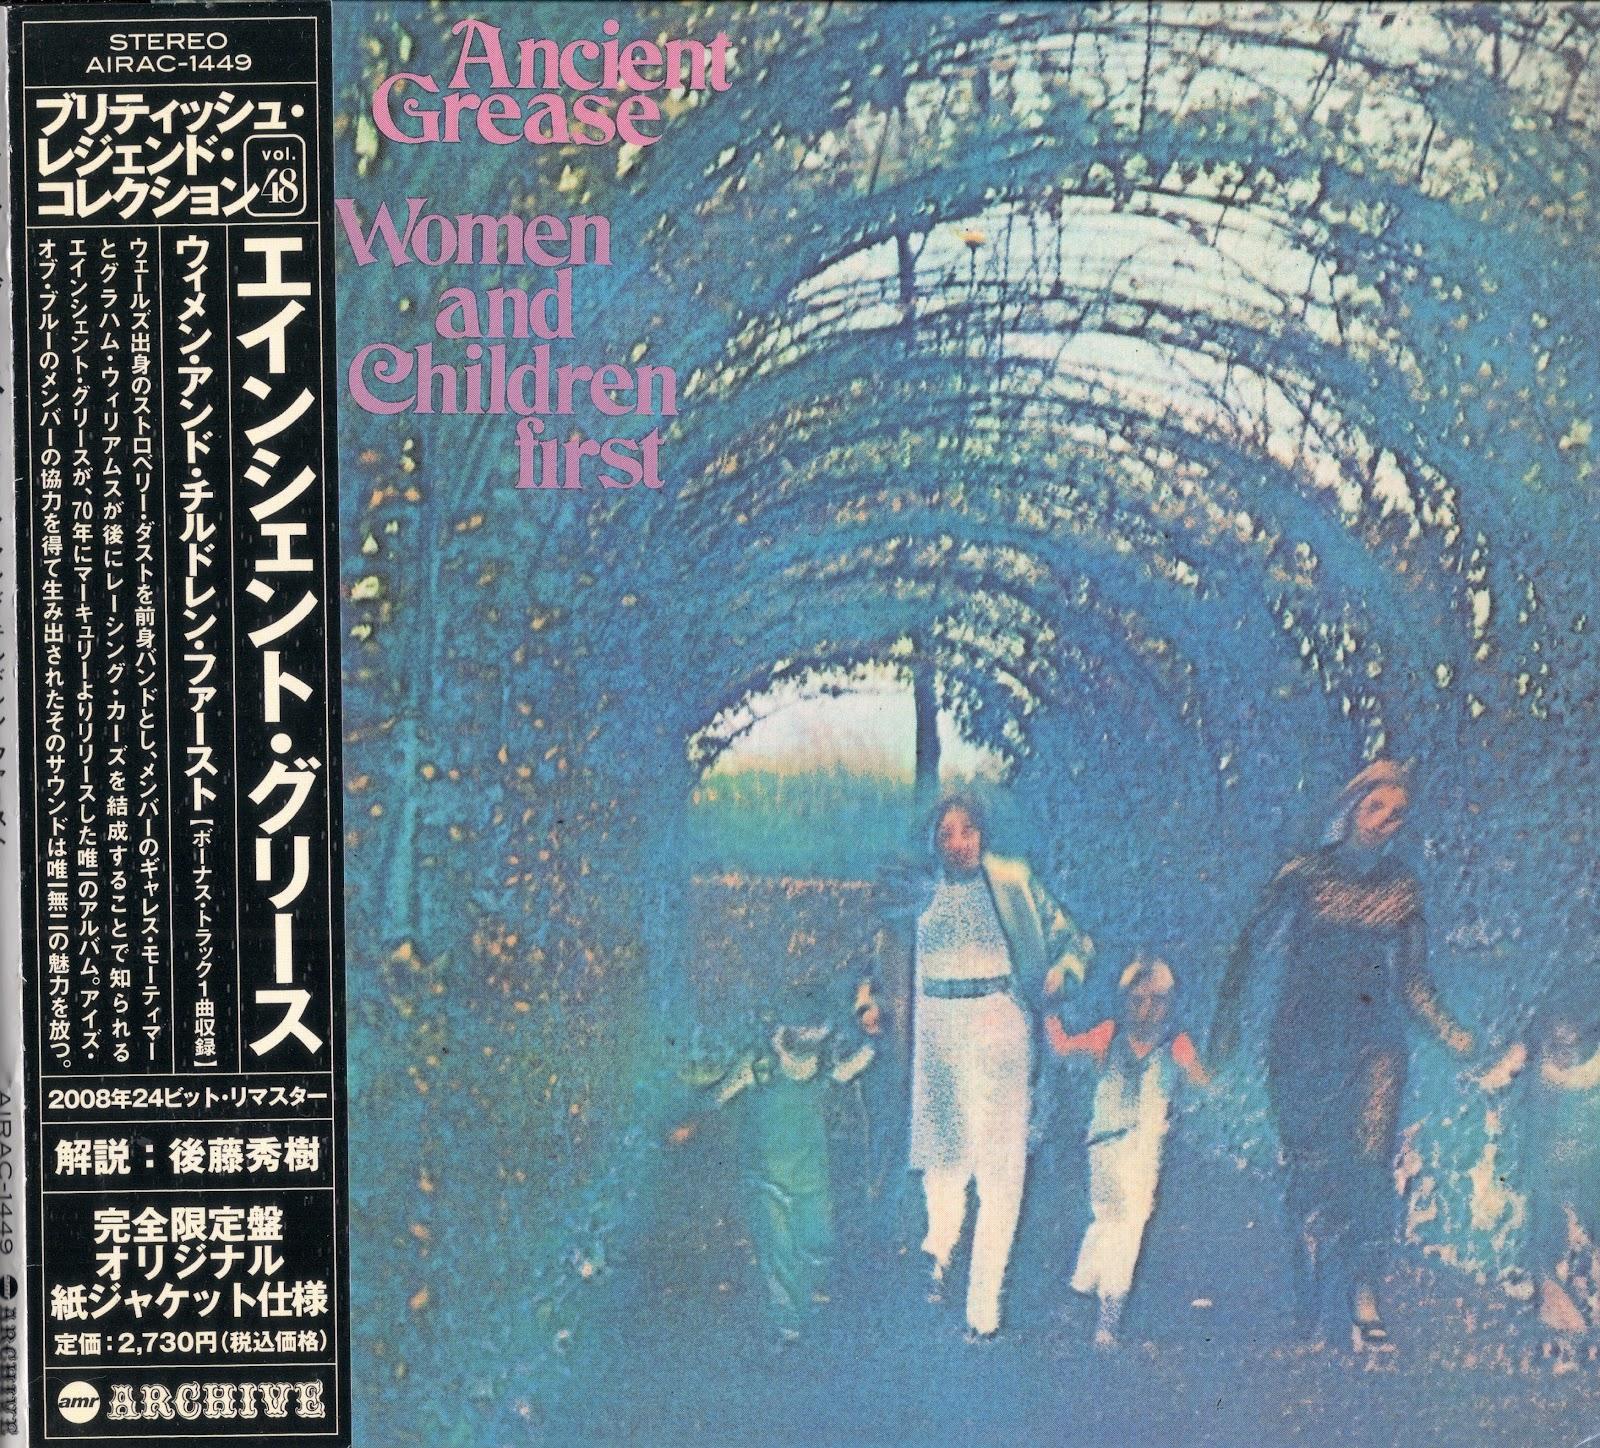 dead can dance - sacd box set (japan remastered) (2008) (flac)